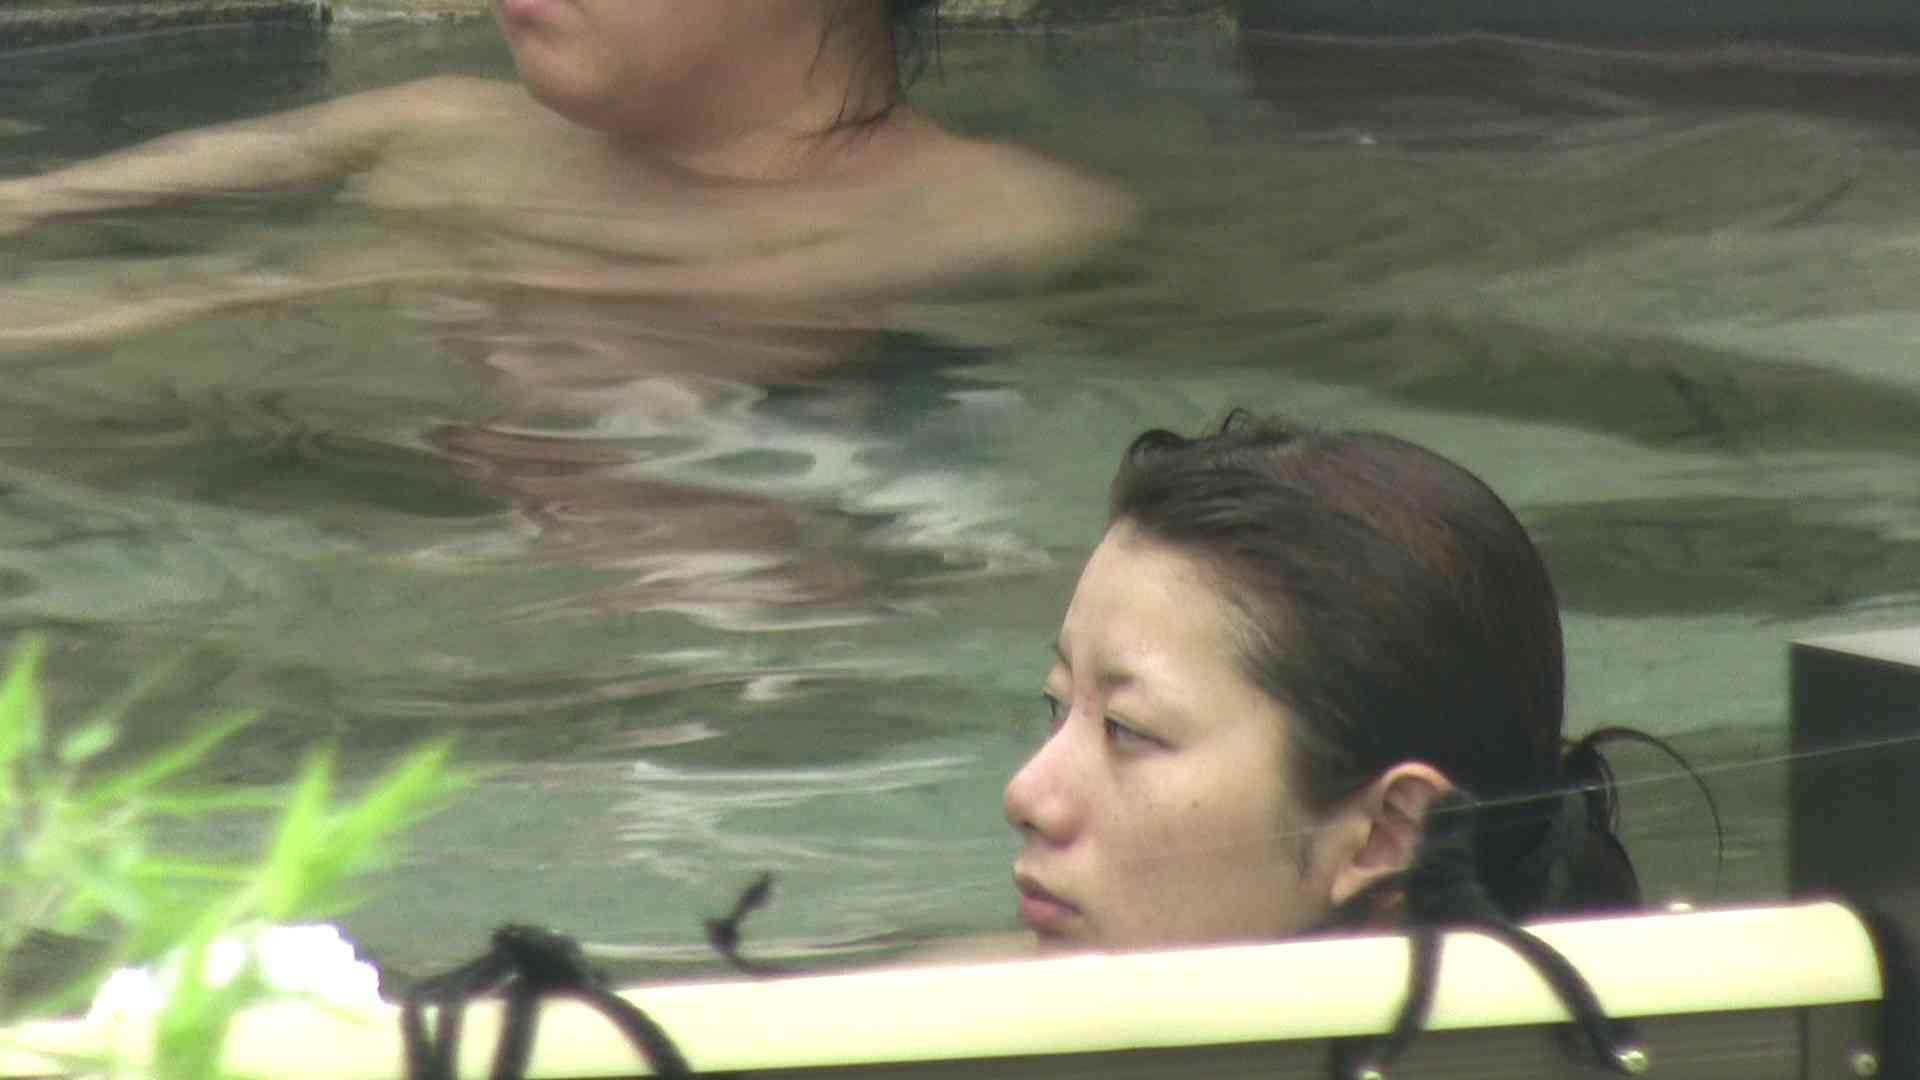 Aquaな露天風呂Vol.19【VIP】 盗撮 | HなOL  88pic 48